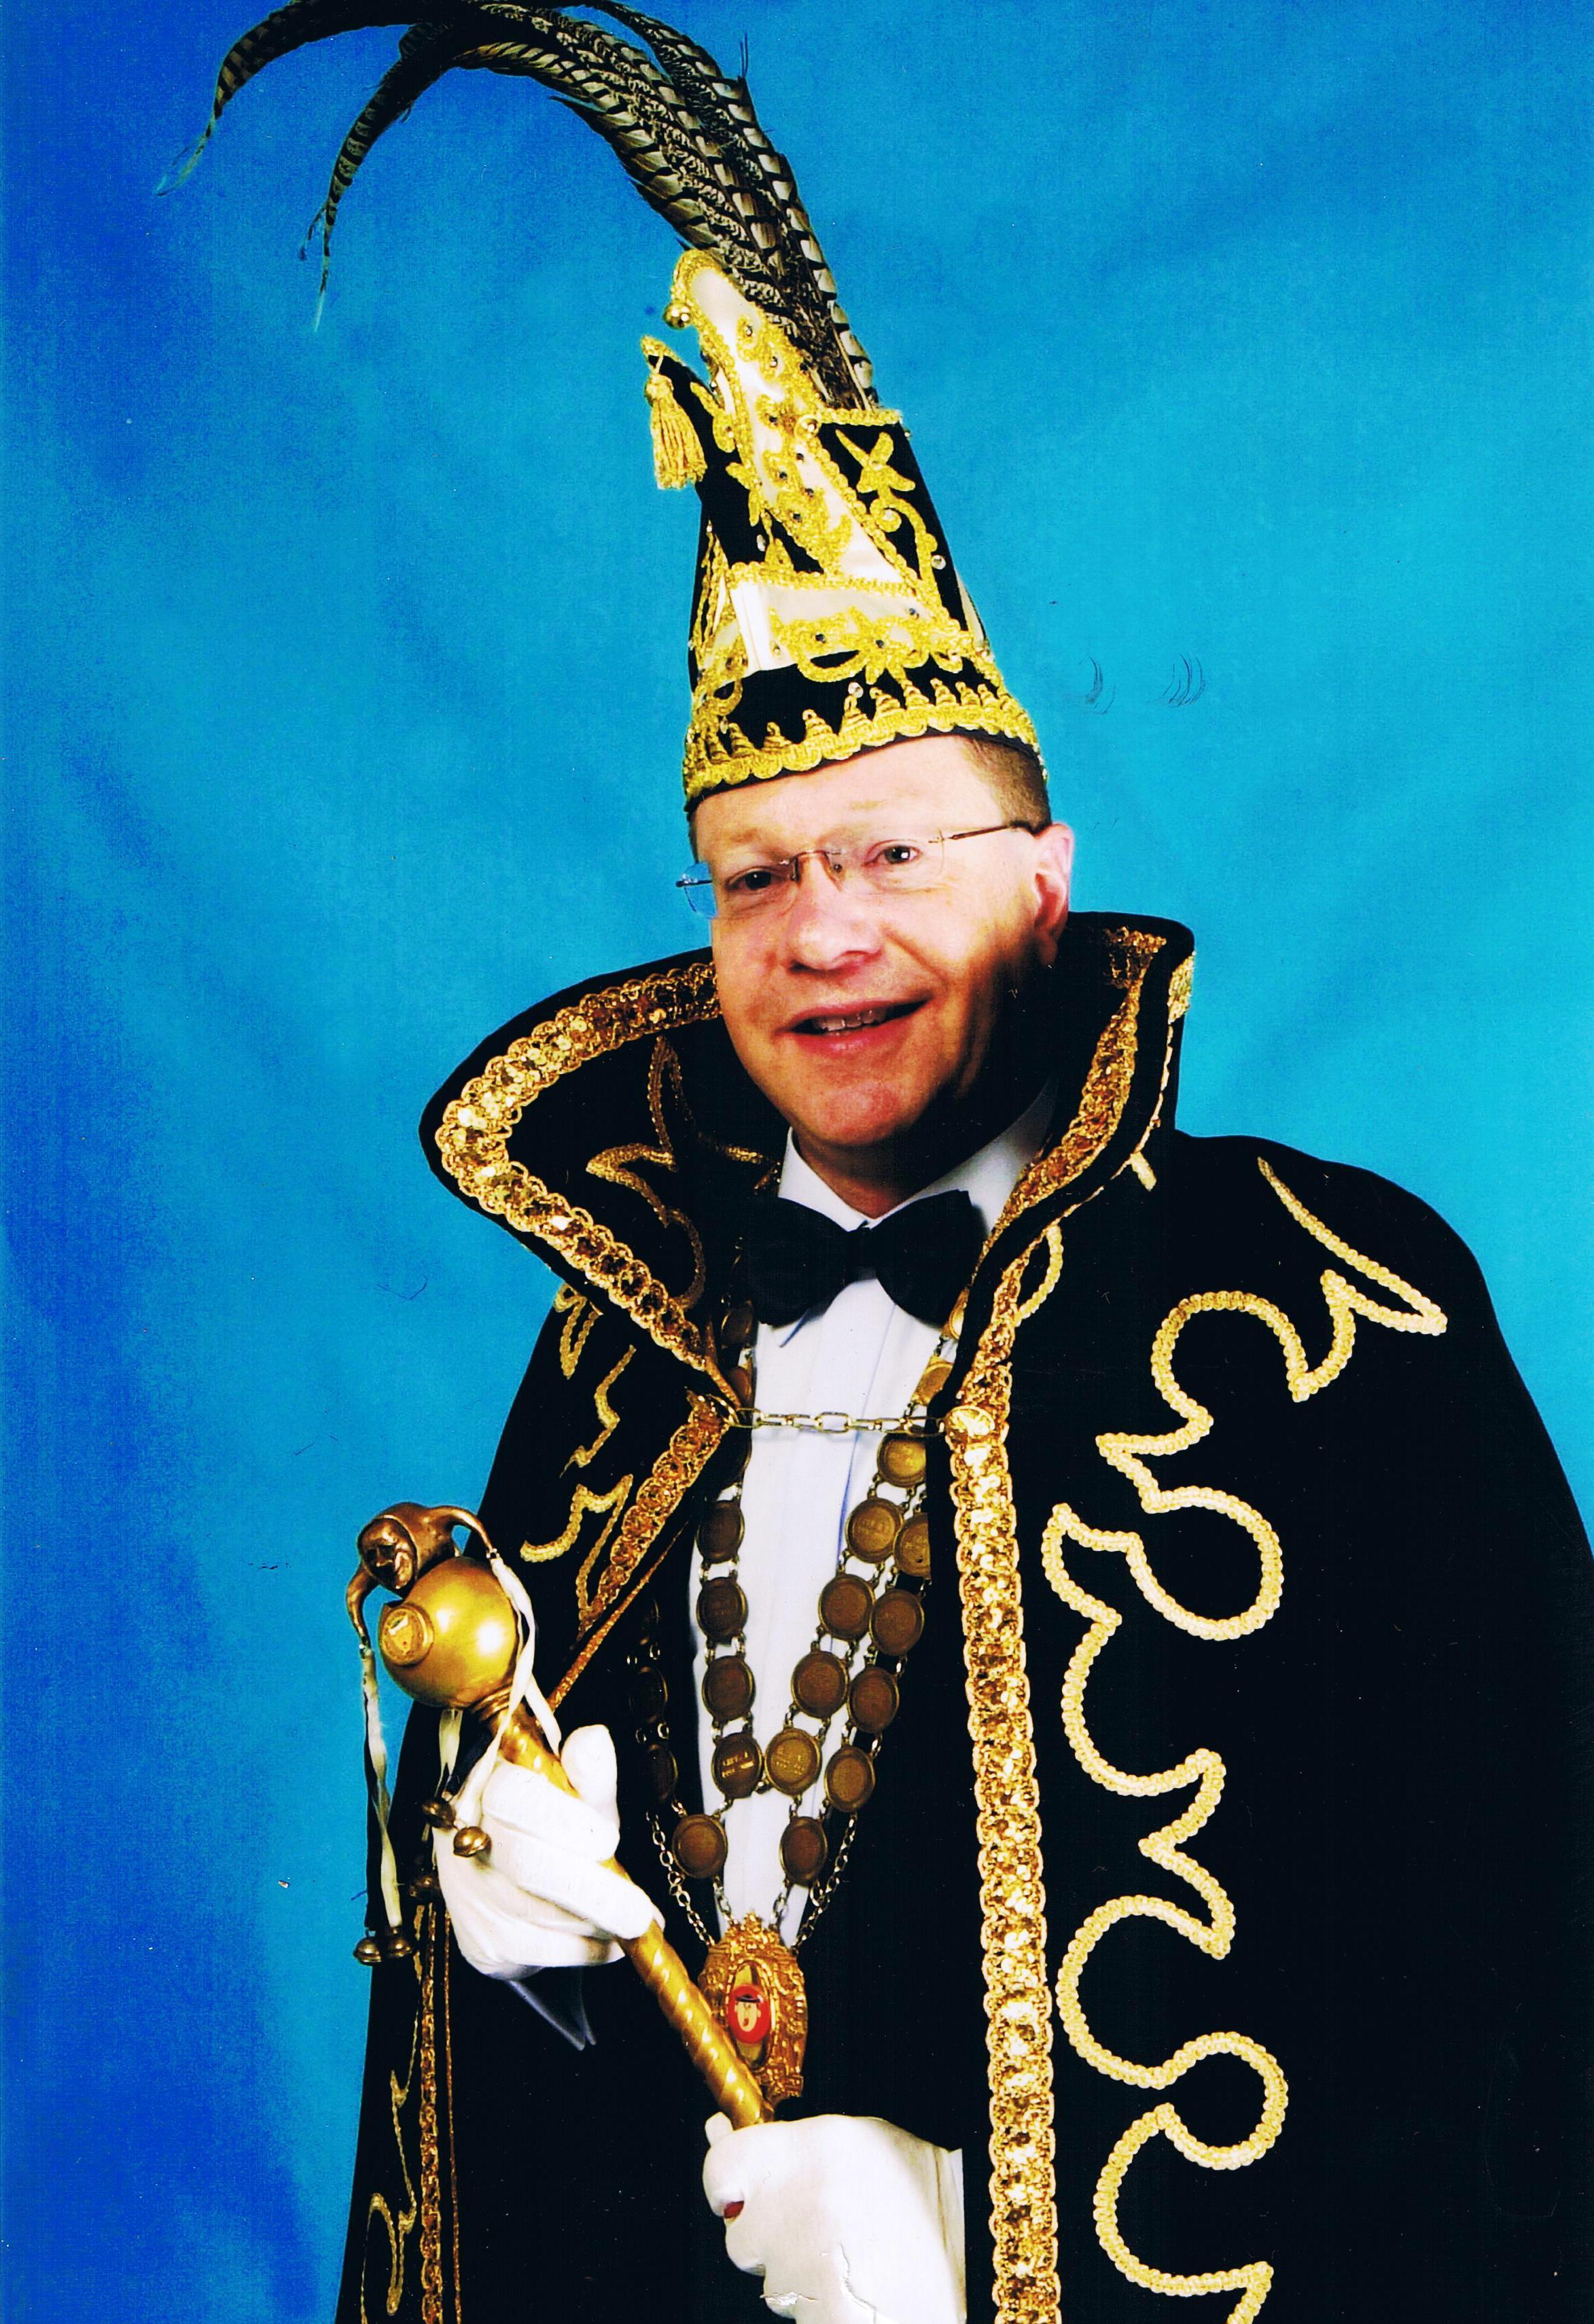 2002 2003 Prins Marcellinus de 1e Marcel Massar